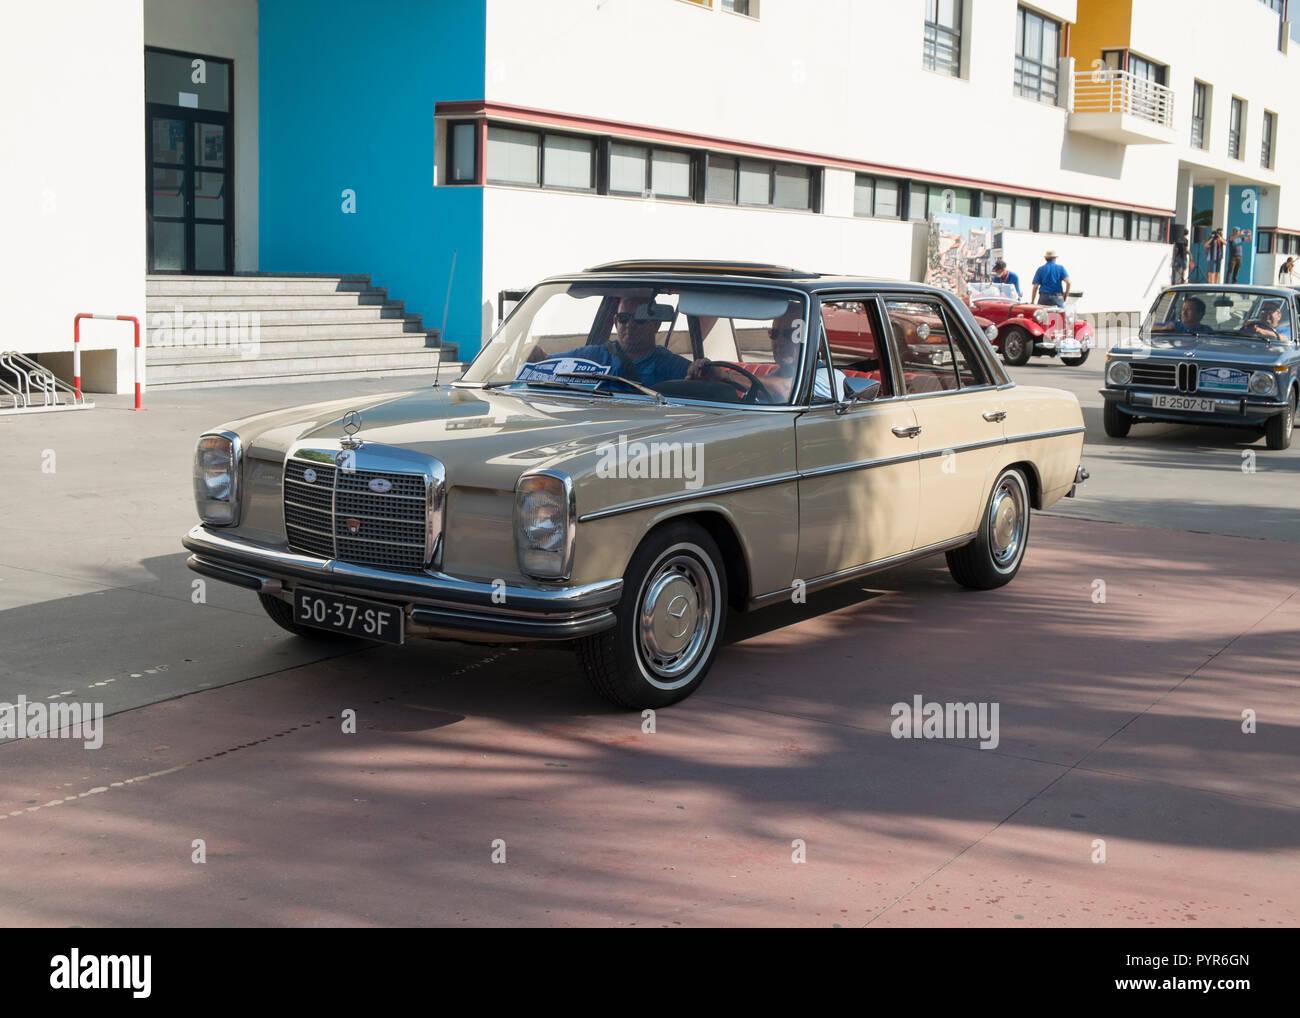 Mercedes W114 250 automático. Reunión de coches clásicos en Torremolinos, Málaga, España. Foto de stock